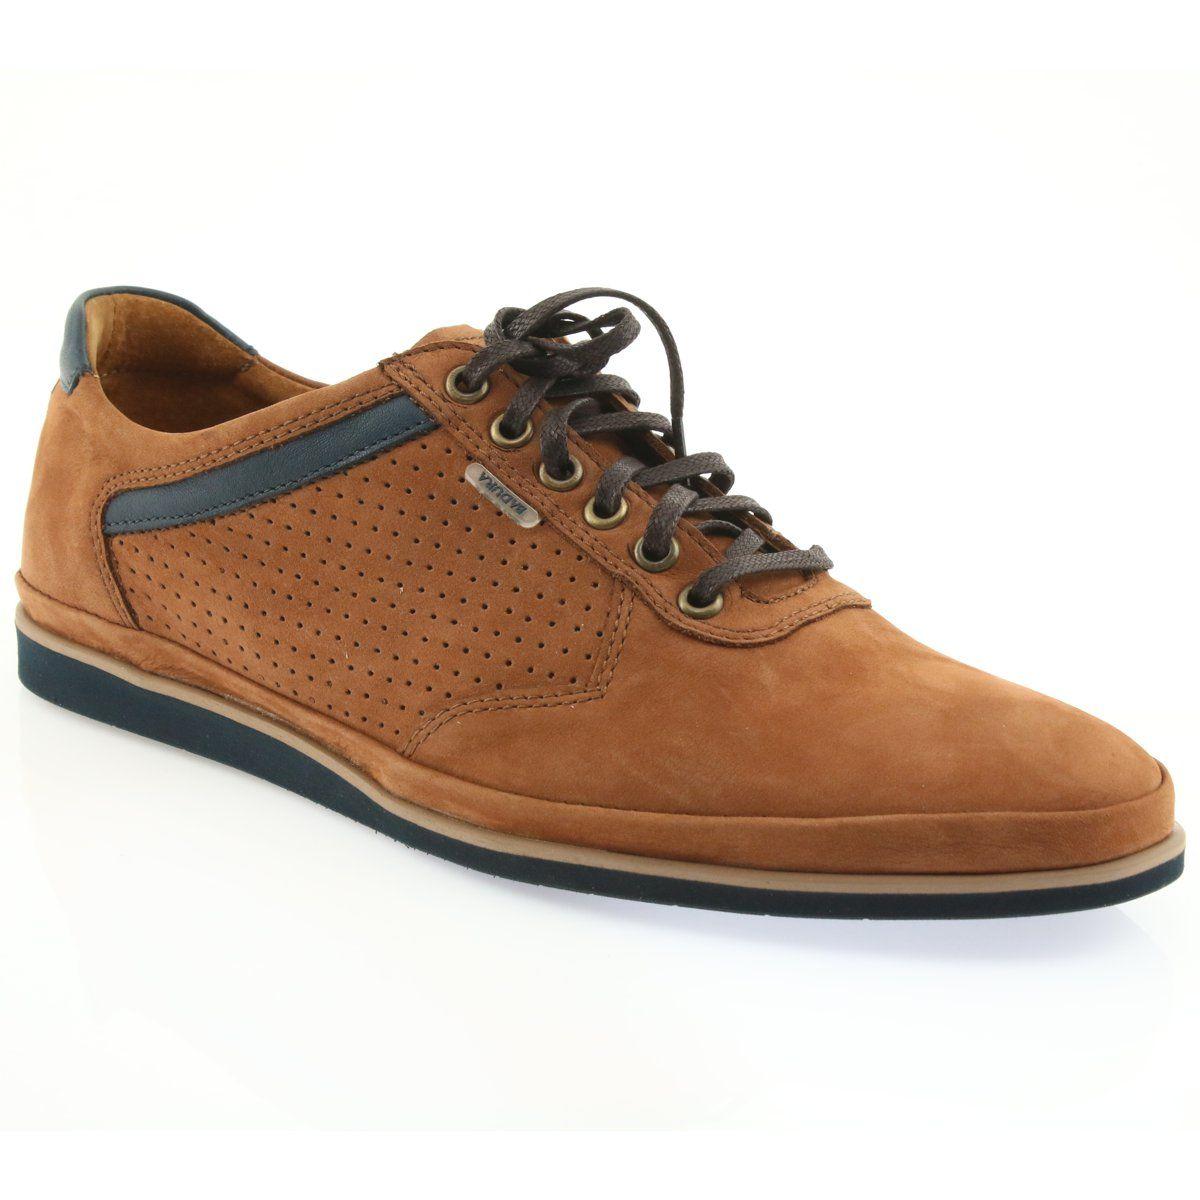 Lekkie Polbuty Sportowe Badura 3523 Brazowe Shoes Air Max 90 Leather Shoes Mens